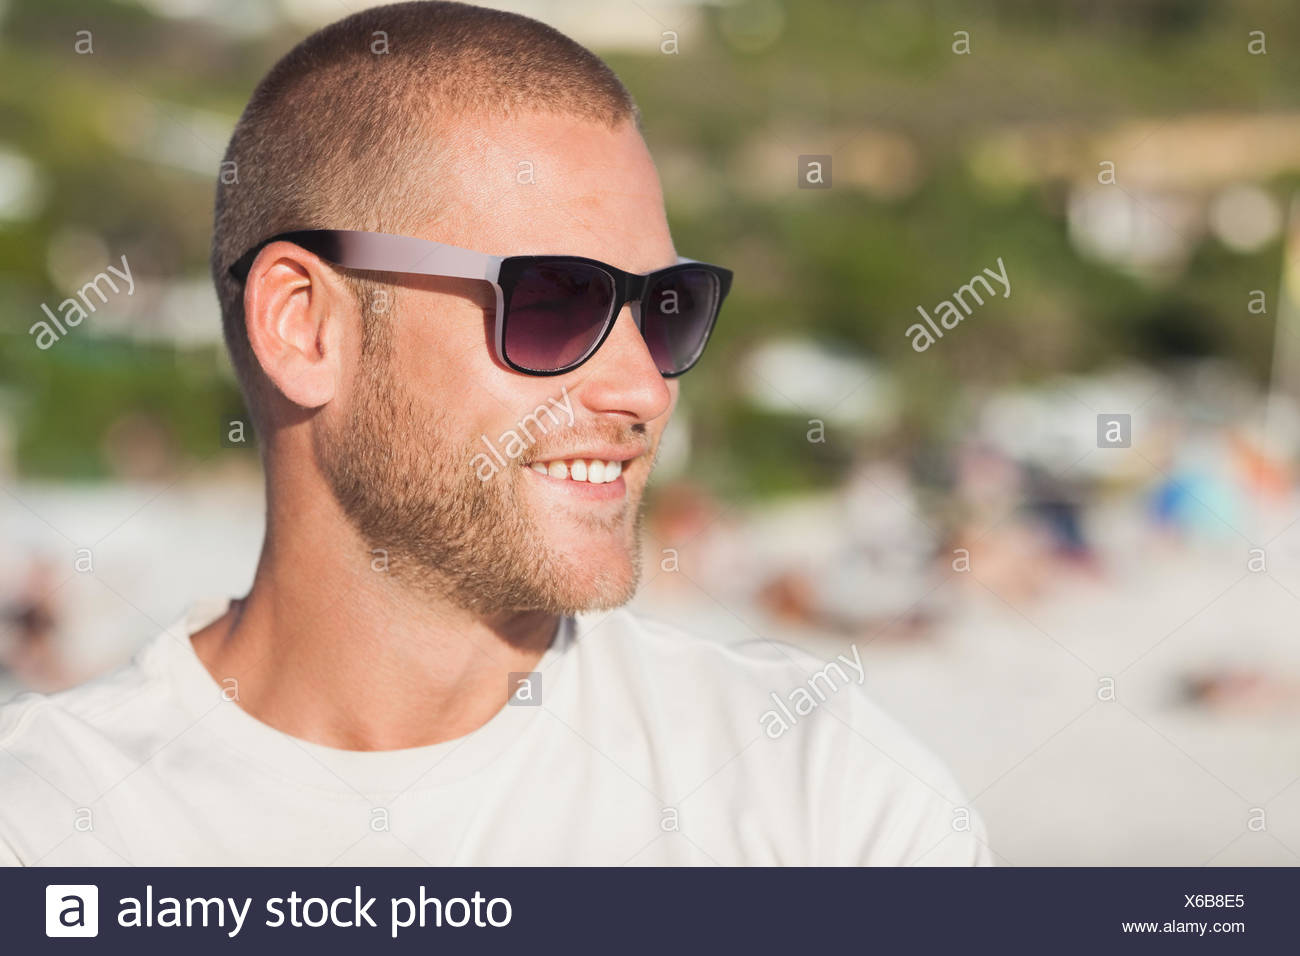 cdba2aa64763 Handsome young man on the beach wearing sunglasses looking away ...